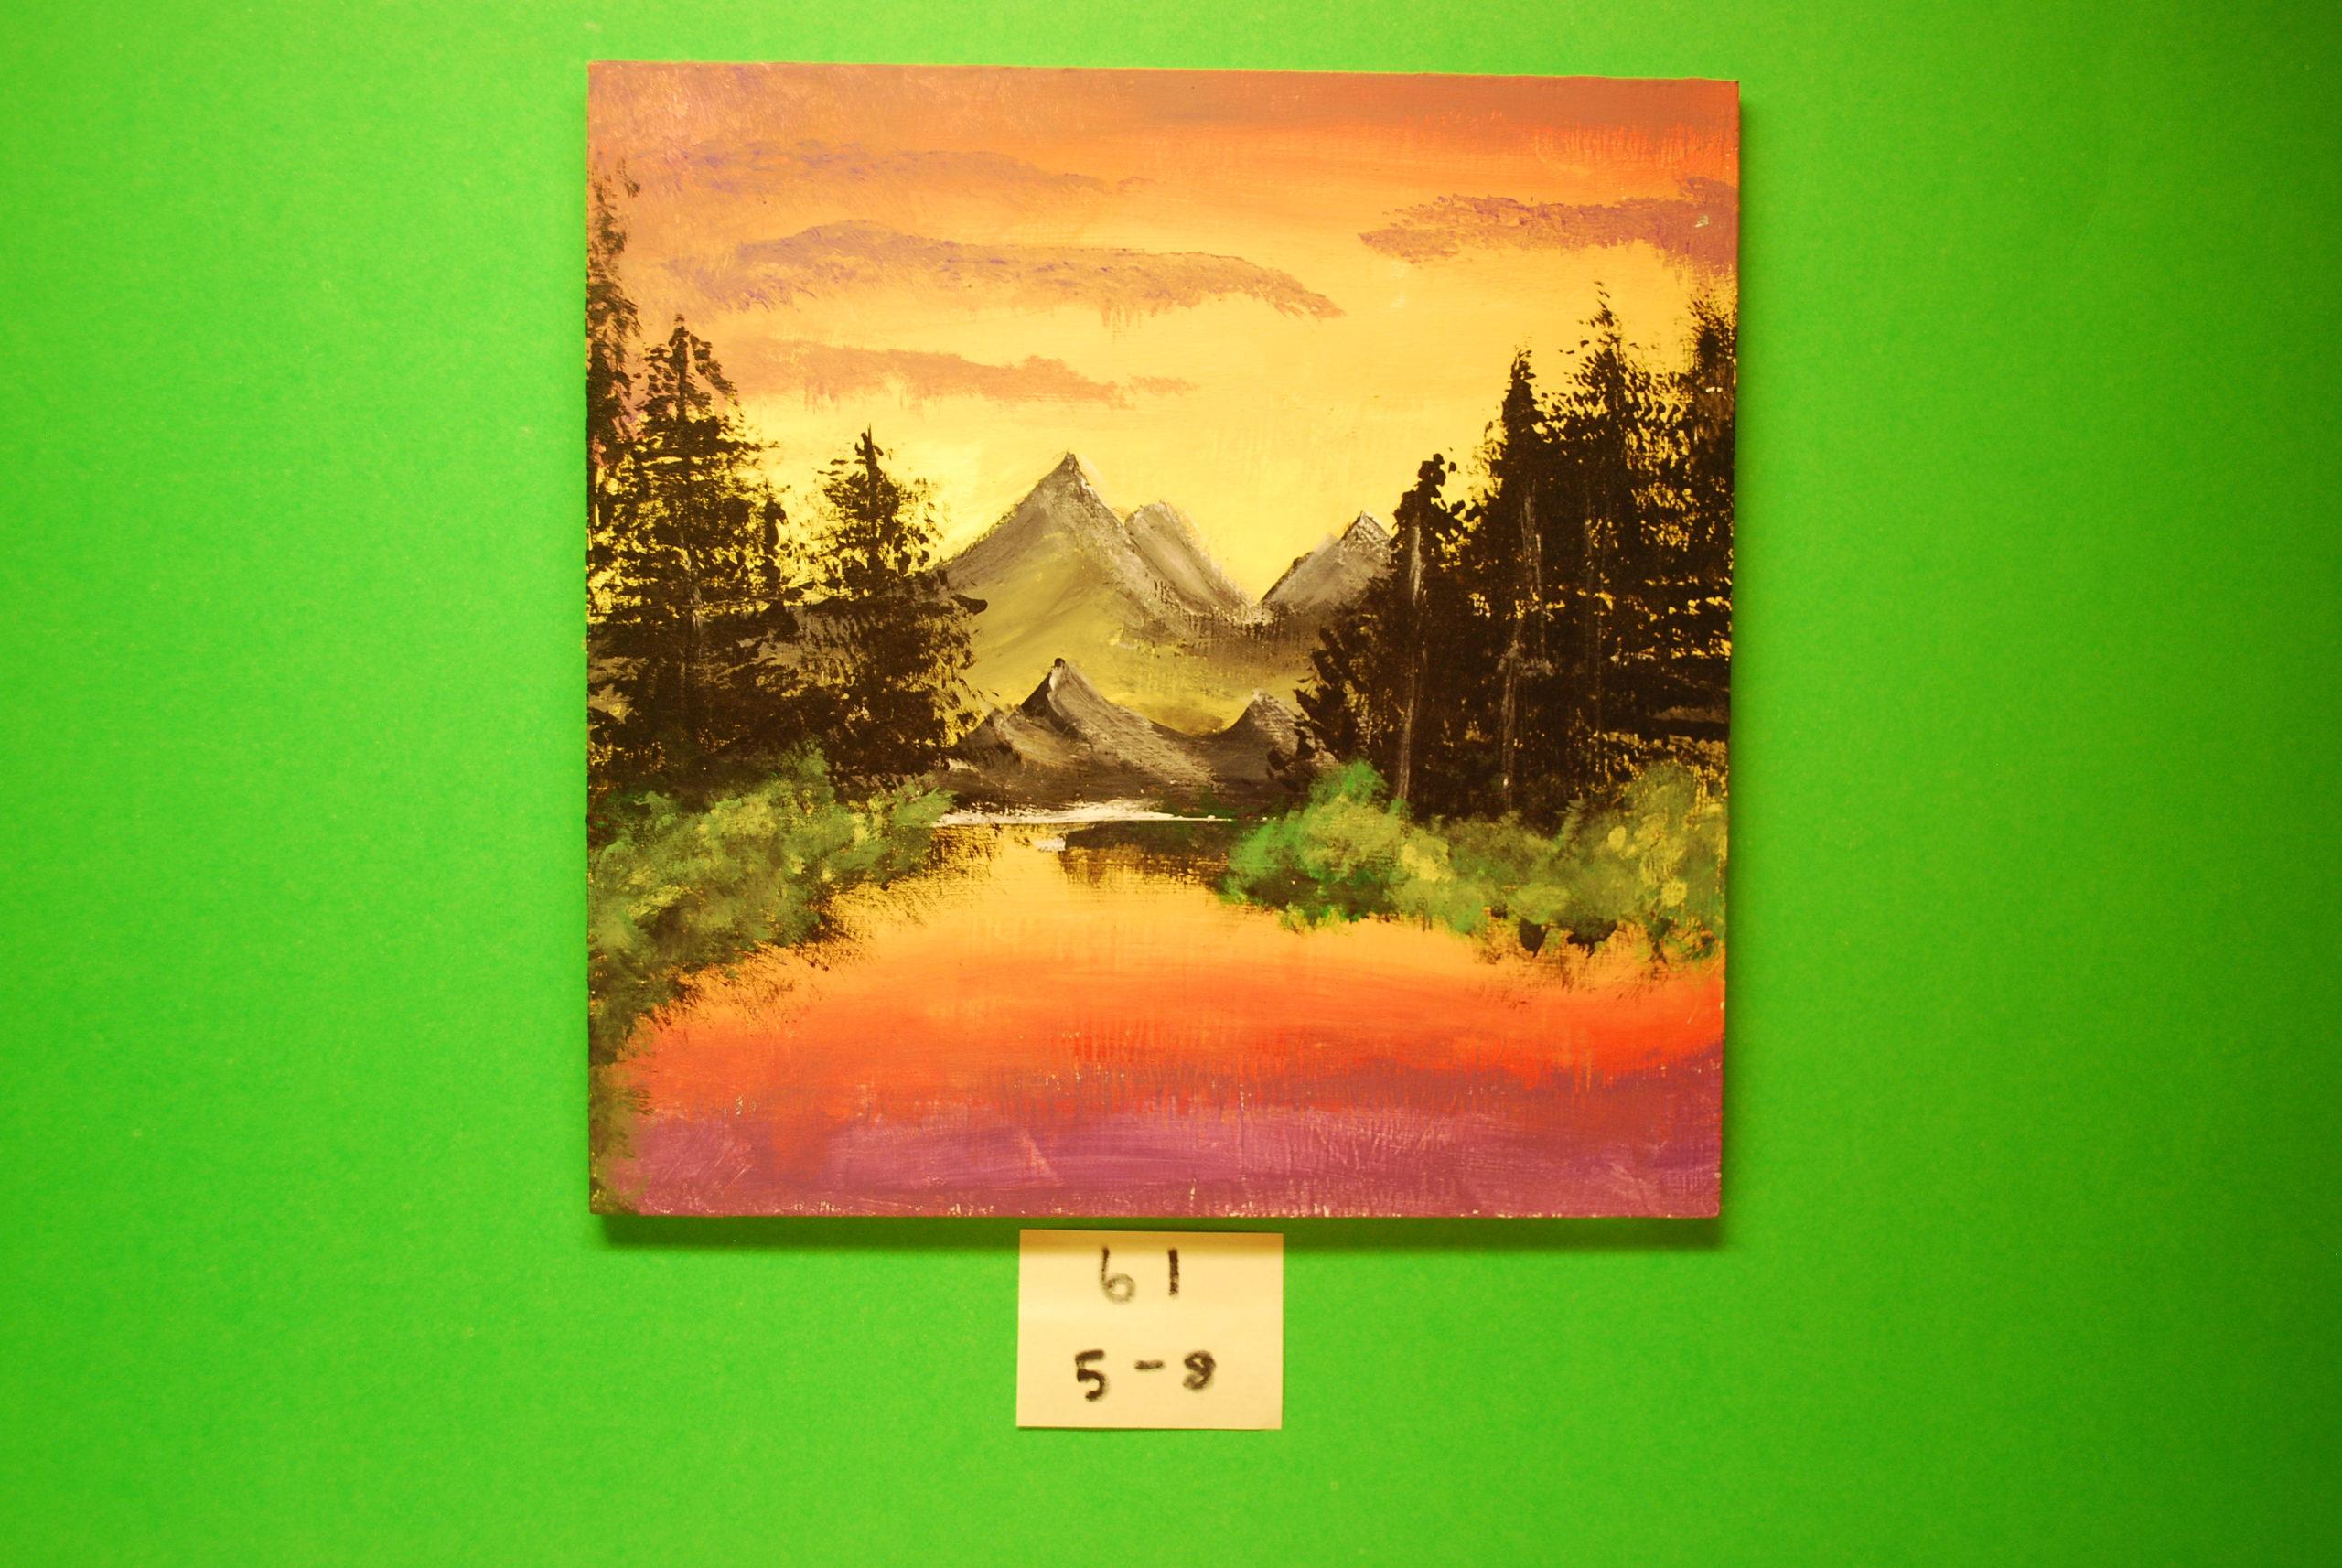 YAC 2020 #61 5-8 Mountain a